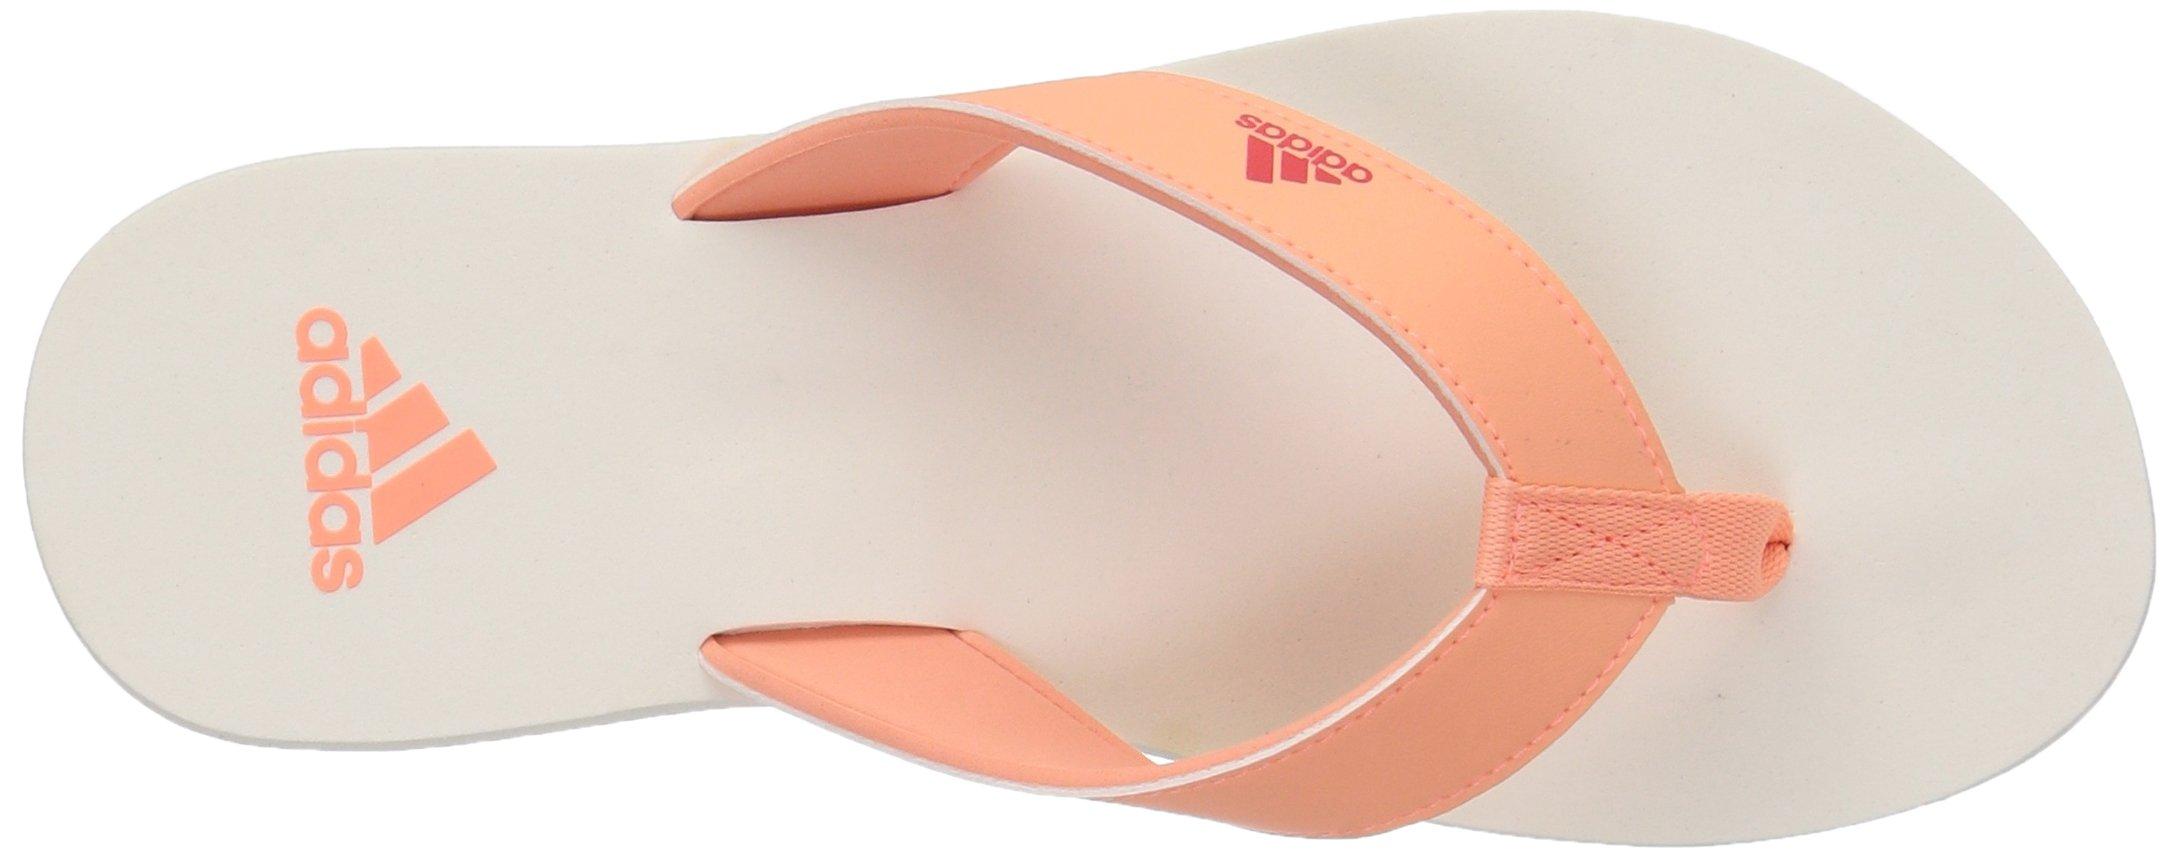 adidas Performance Unisex-Kids Beach Thong 2 K, White/Hi-Res Blue/White, 13 M US Little Kid by adidas (Image #8)